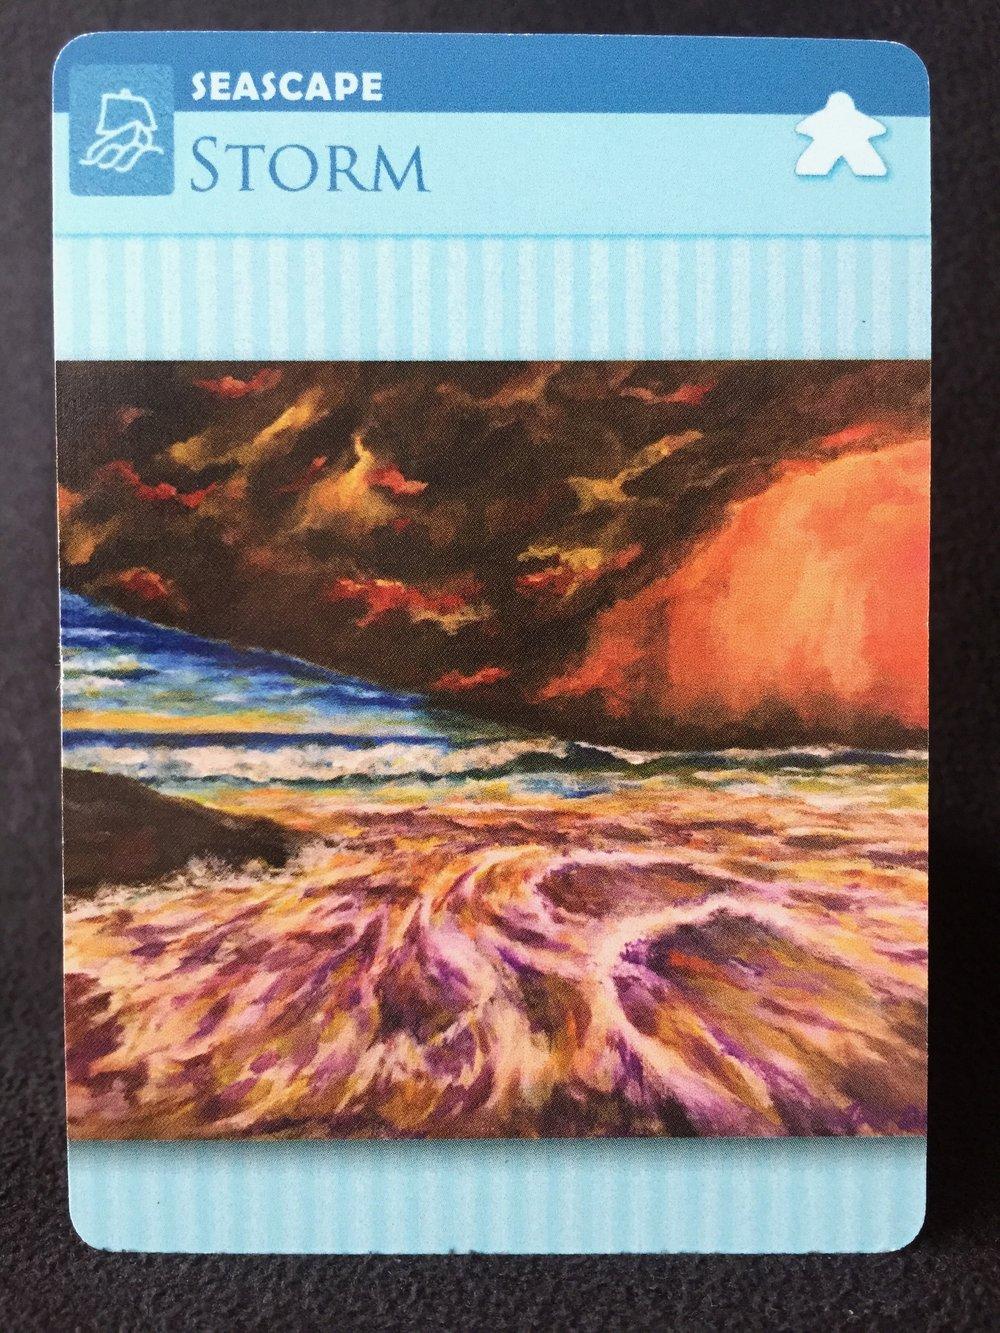 seascape storm.jpeg